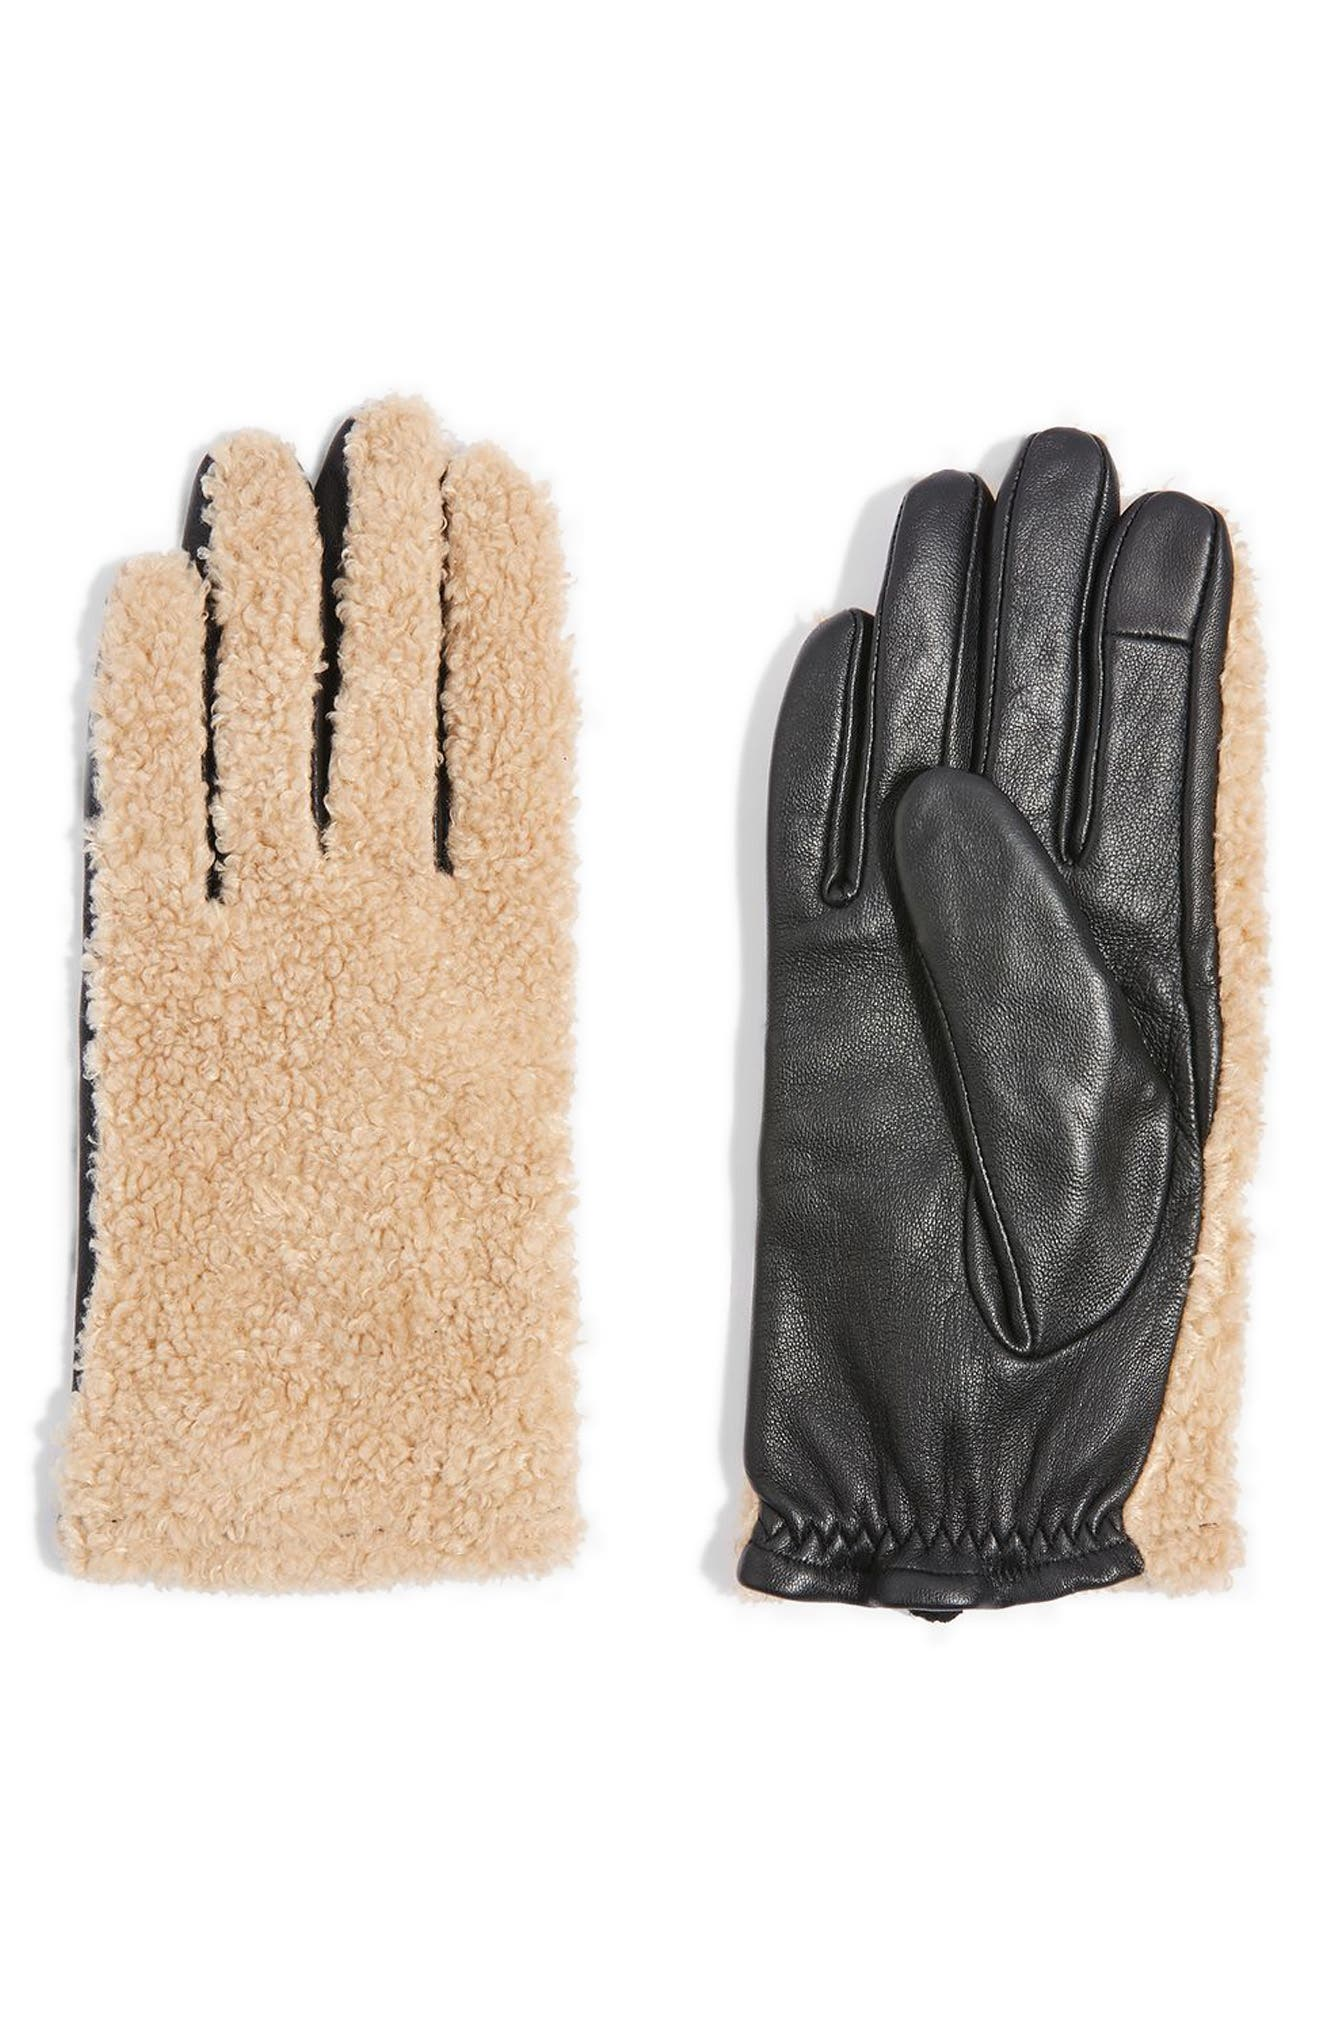 Topshop Faux Fur & Leather Gloves